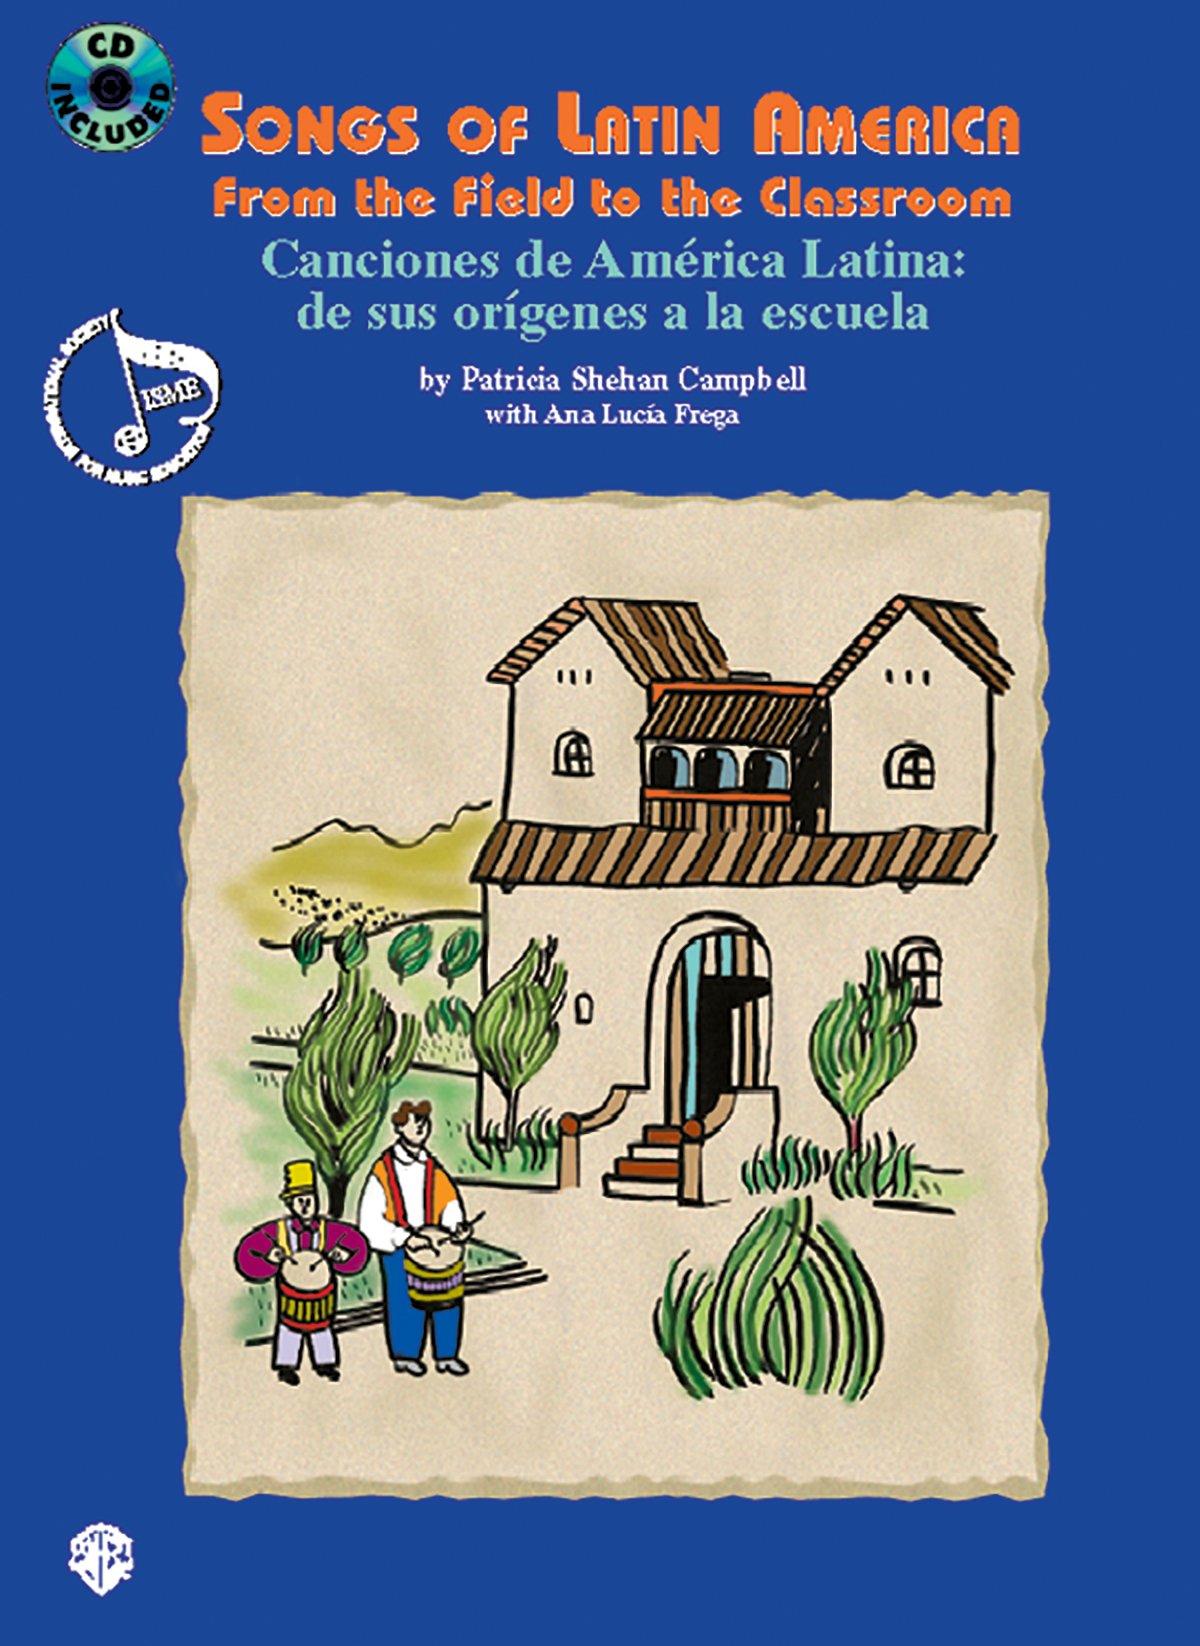 Download Songs of Latin America -- From the Field to the Classroom: Canciones de América Latina -- de sus orígenes a la escuela (English/Spanish Language Edition), Book & CD (English and Spanish Edition) ebook